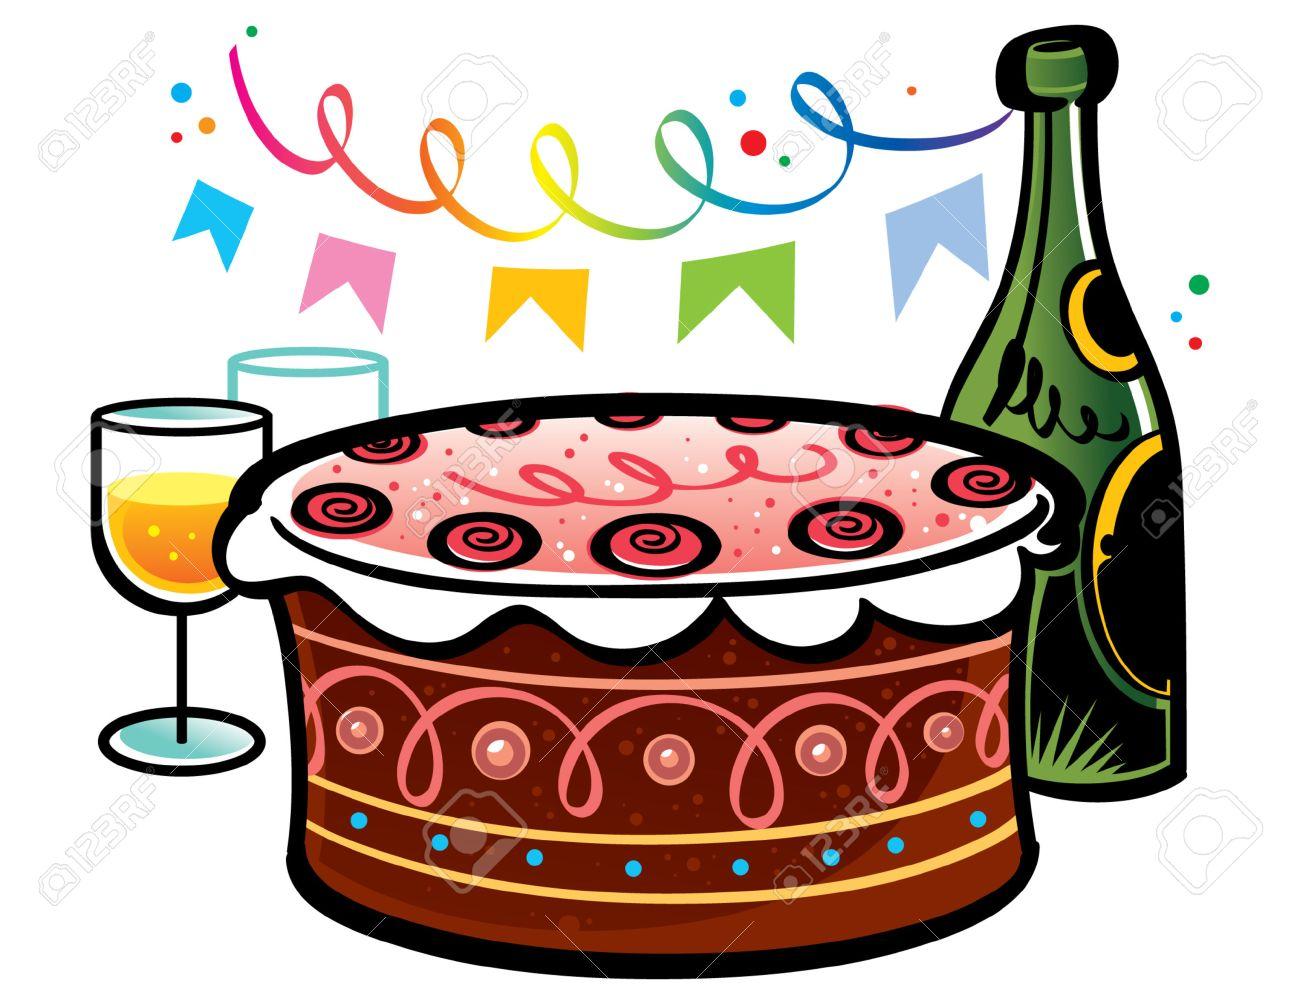 Clipart champagne anniversaire